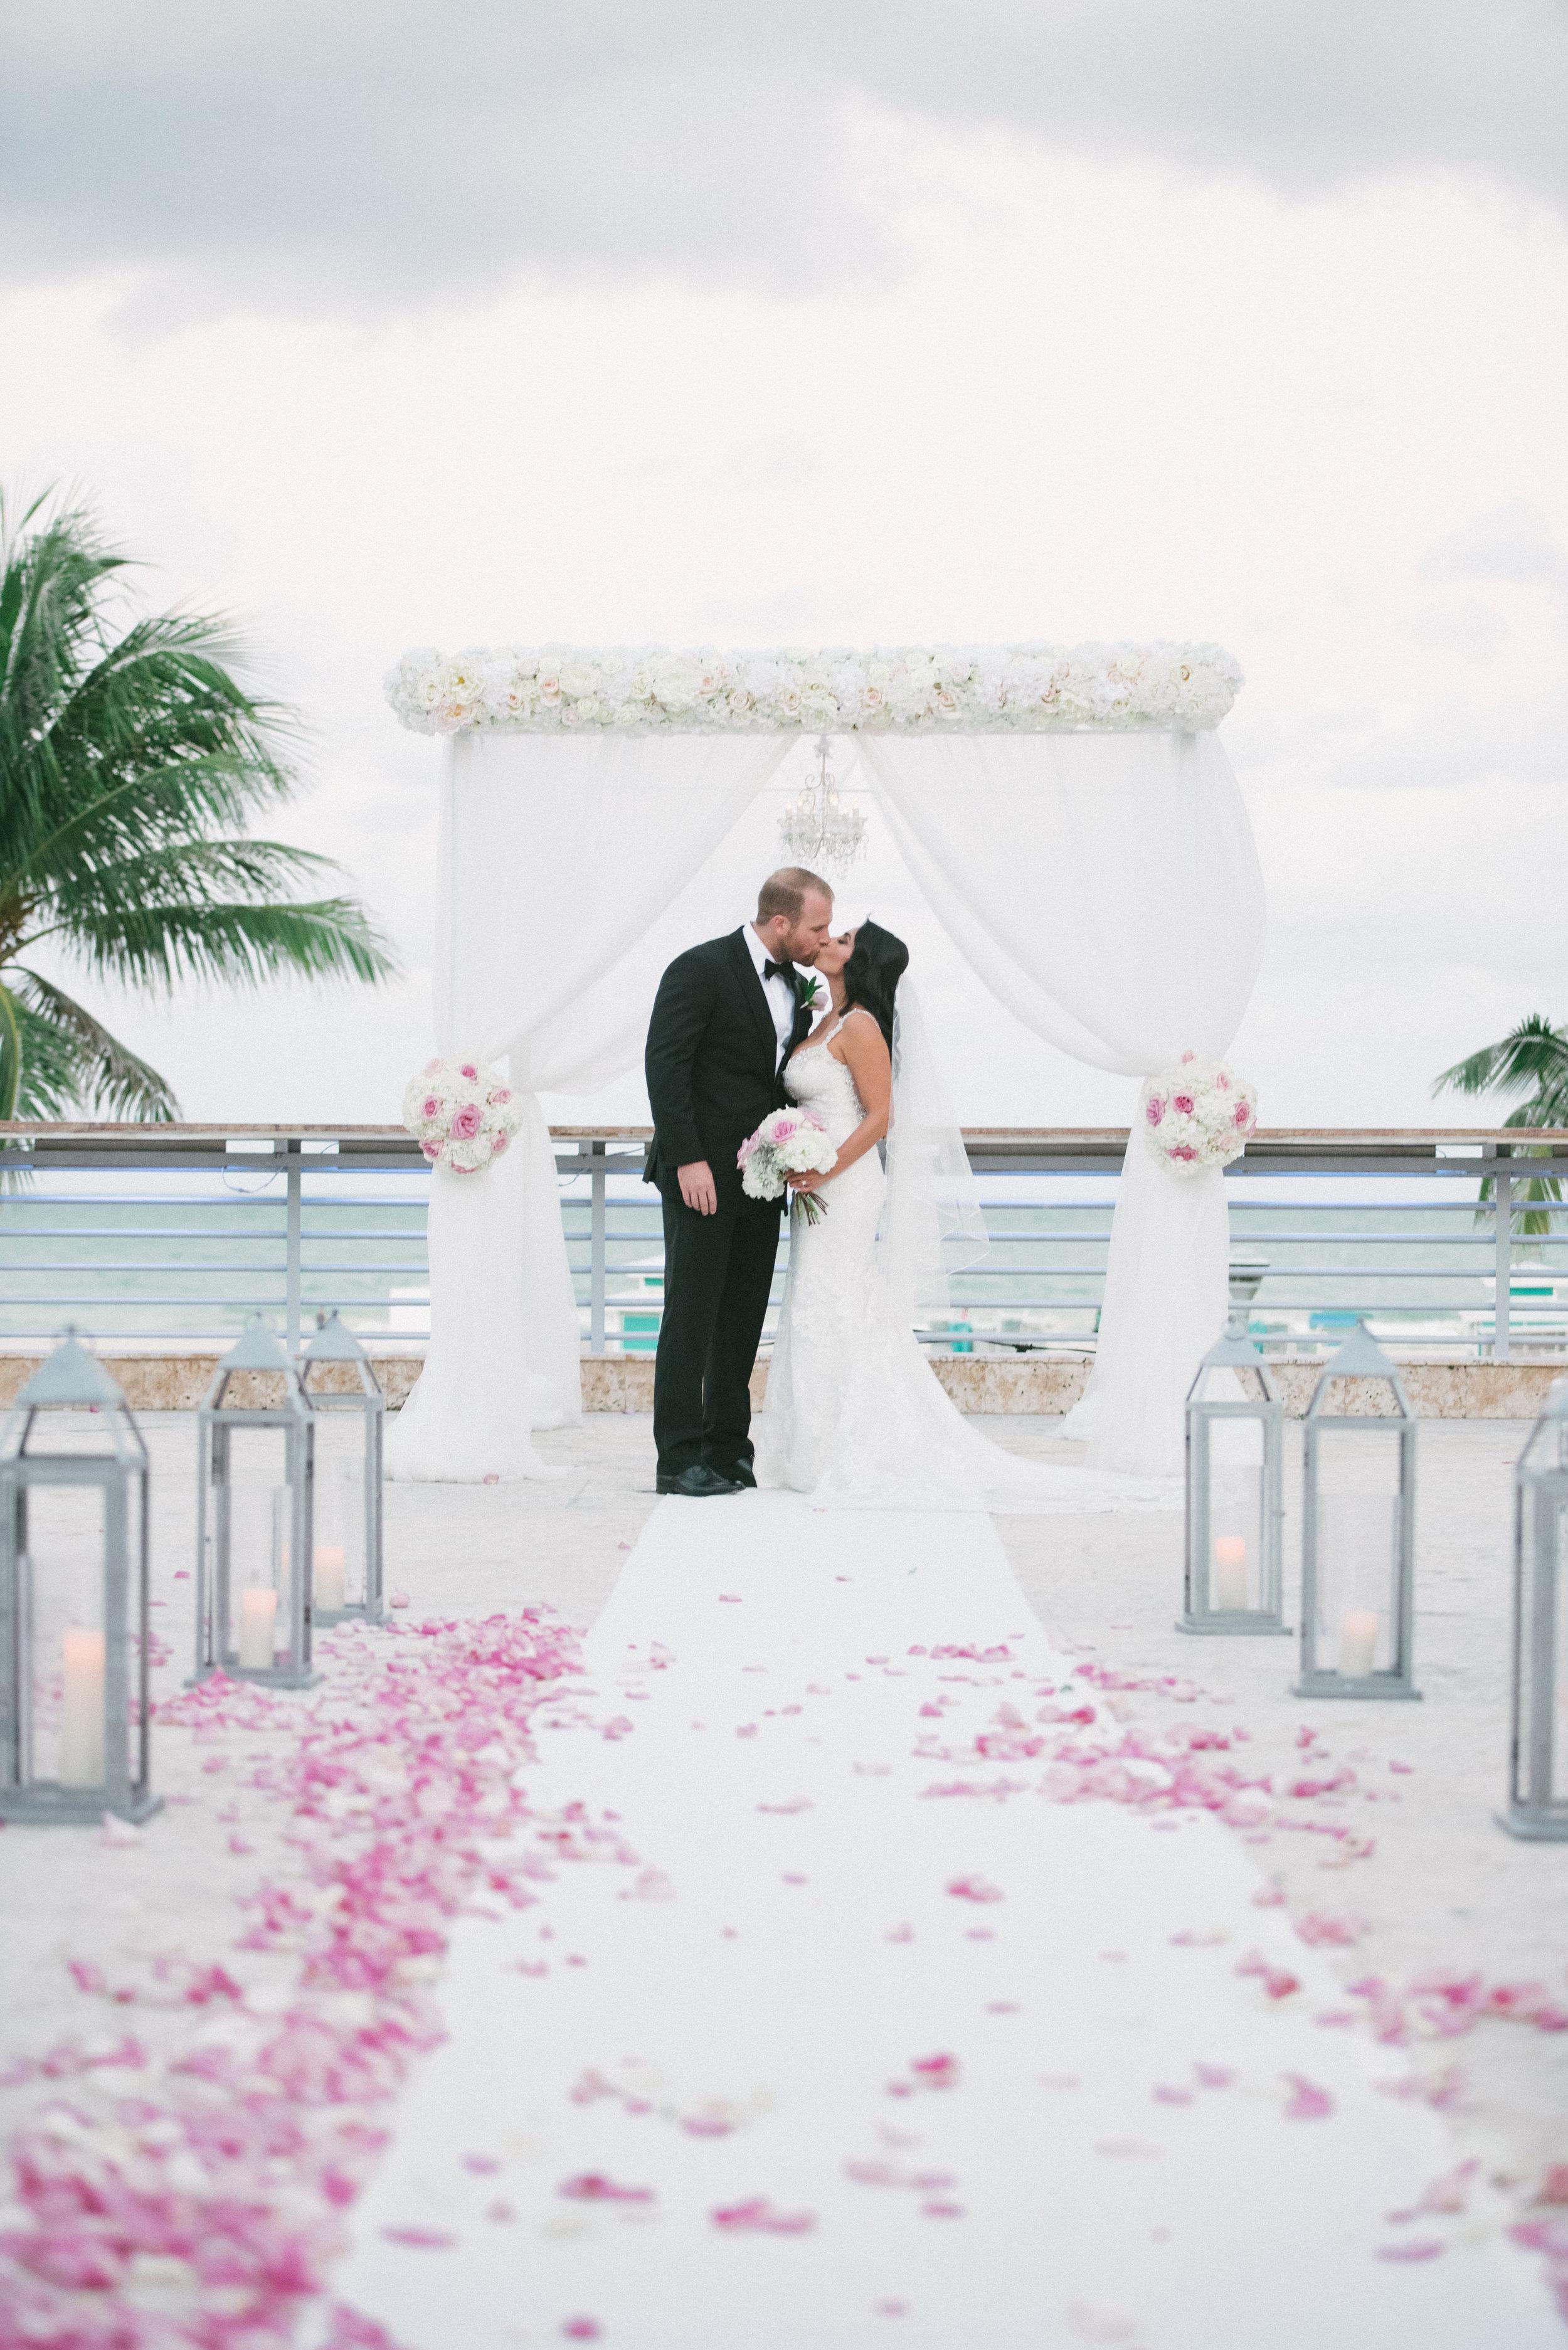 Jenny & Nick Wedding | Miami Oct8th2016 | Highlights-0026.jpg